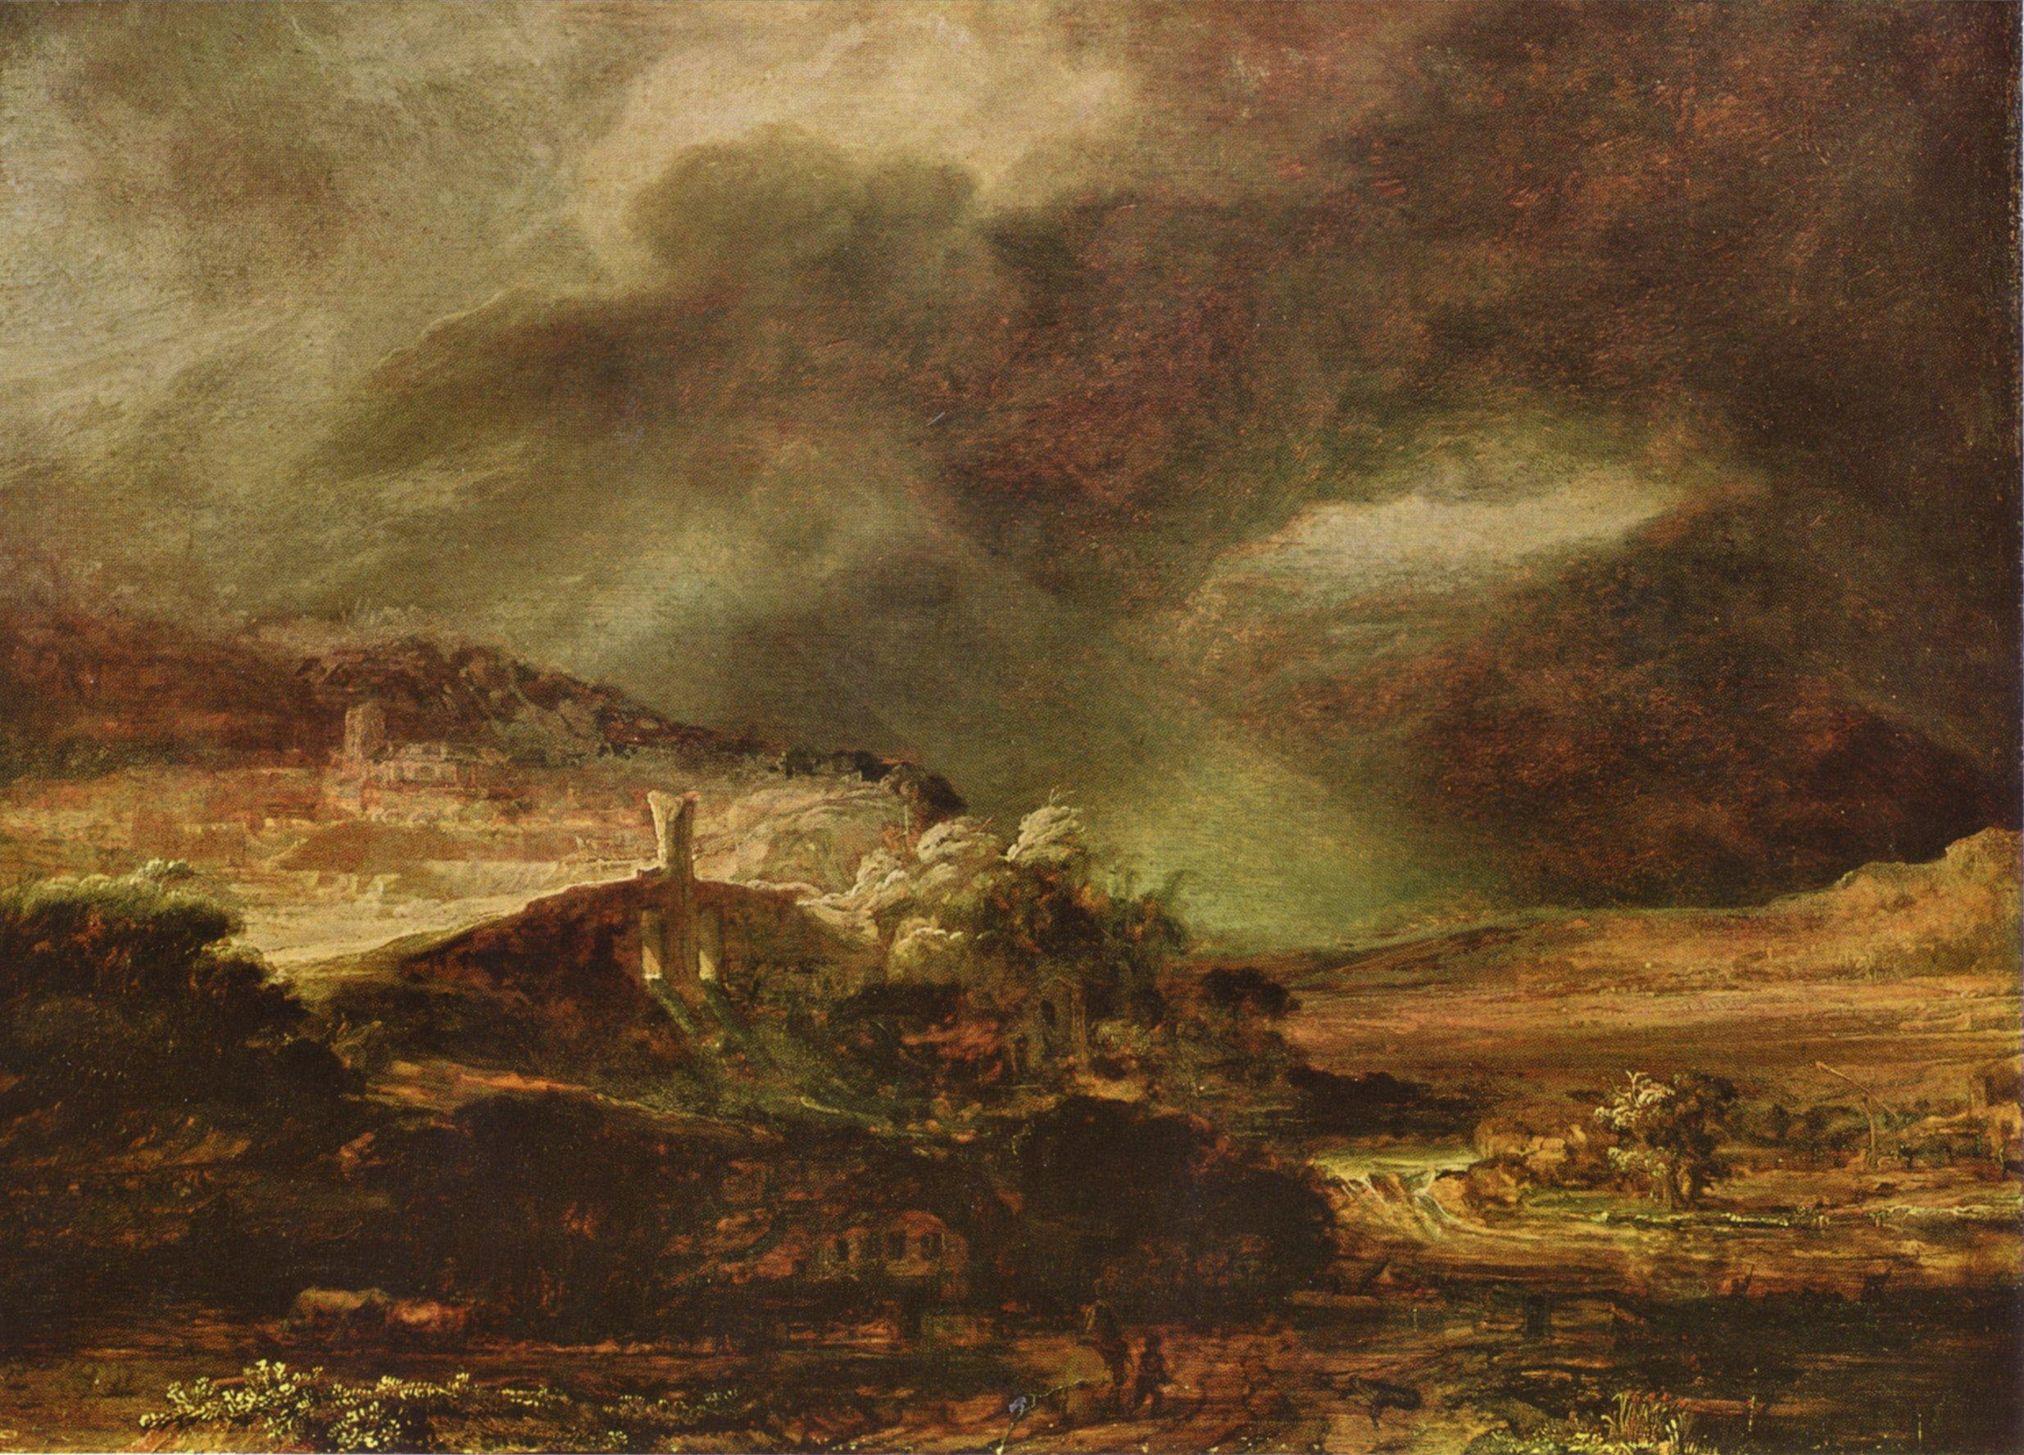 картина Город на холме при надвигающейся грозе :: Харменс ван Рейн Рембрандт - Rembrandt фото